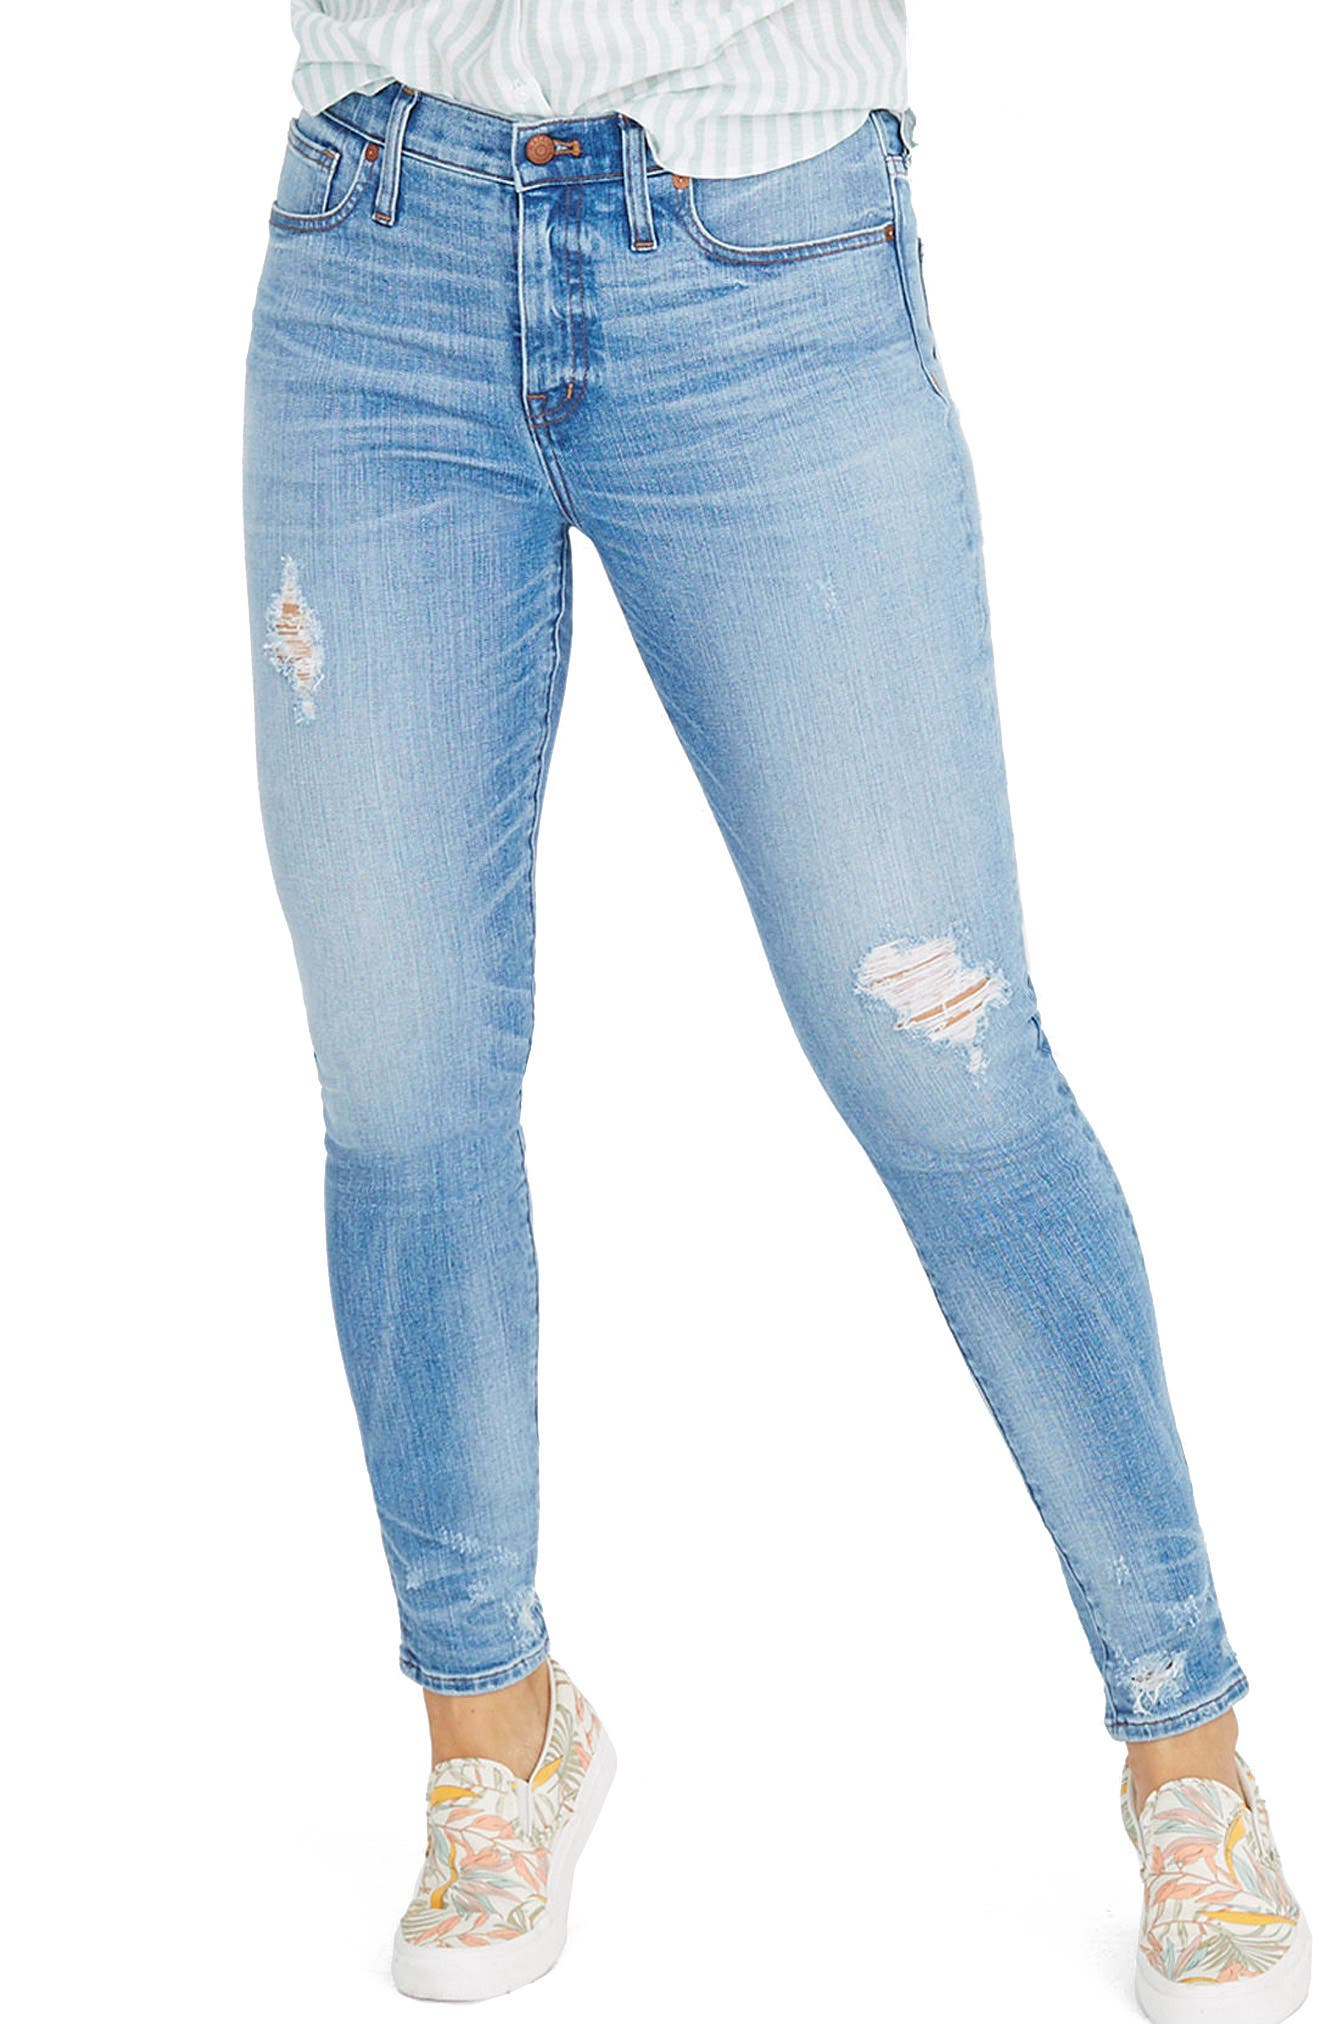 9-Inch Destructed Hem High Waist Skinny Jeans,                         Main,                         color, Cliff Wash